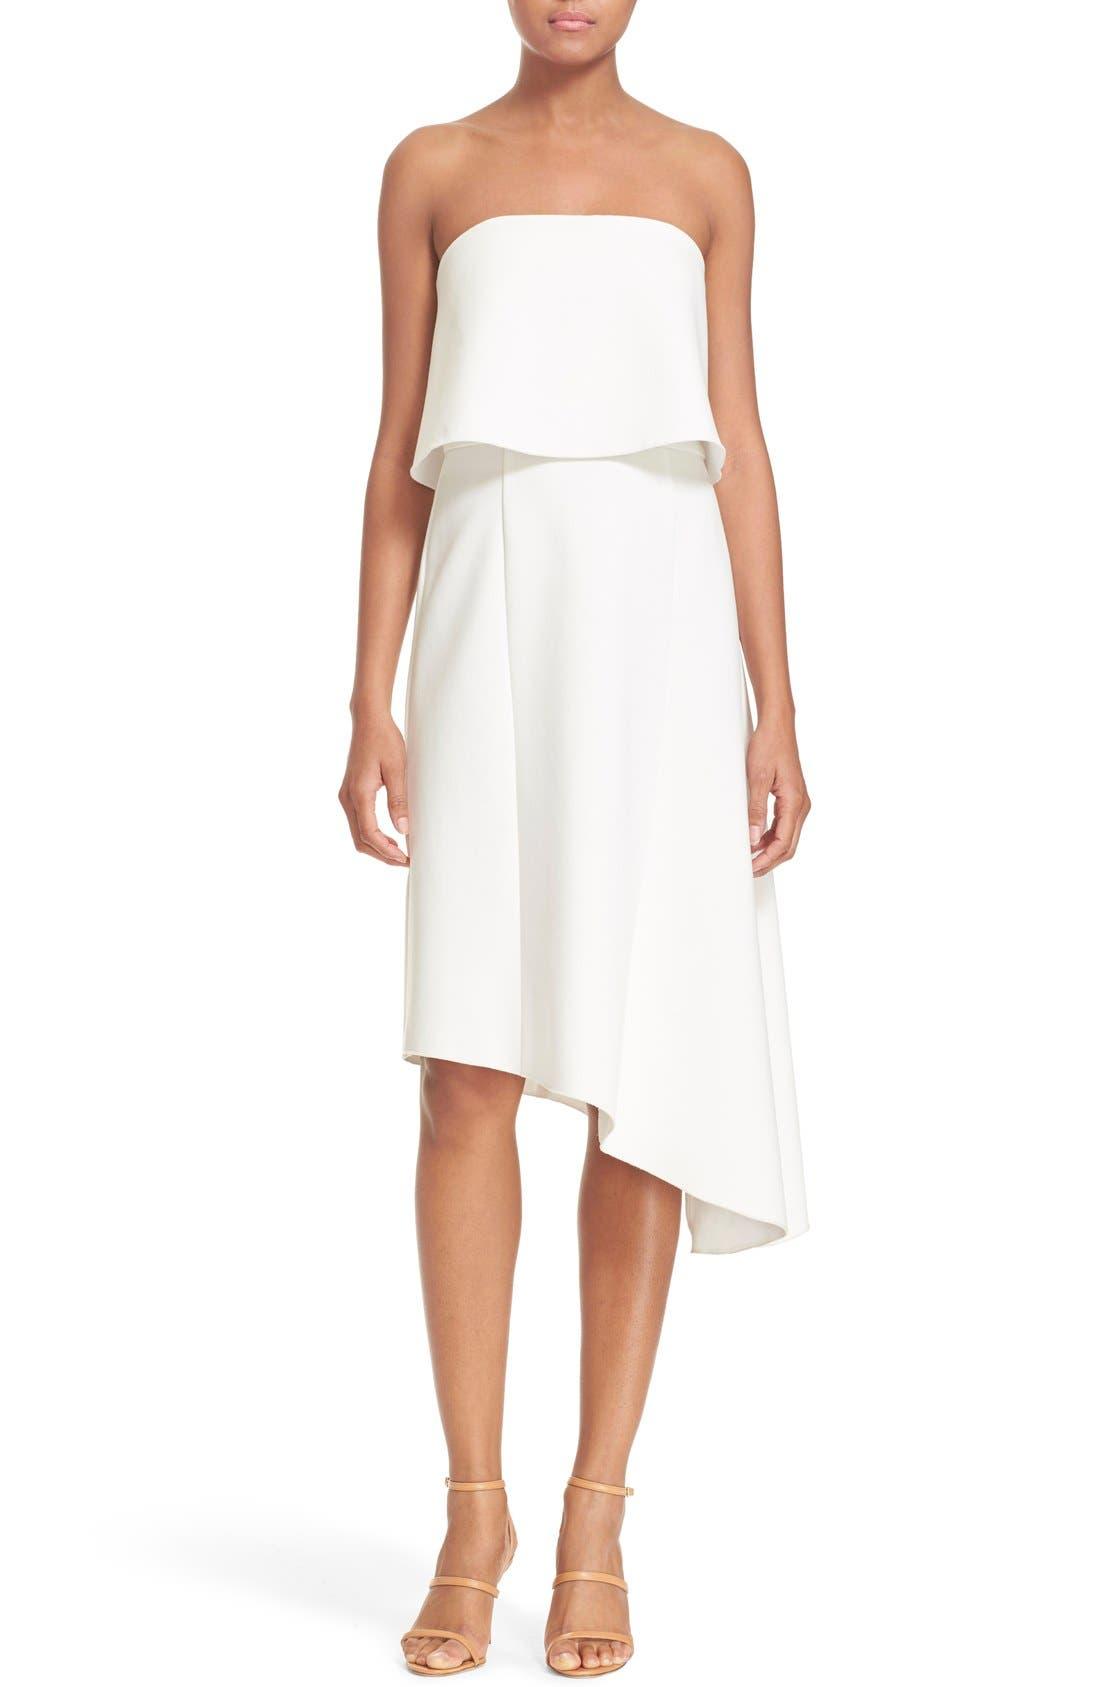 Alternate Image 1 Selected - N Nicholas Strapless Overlay Dress